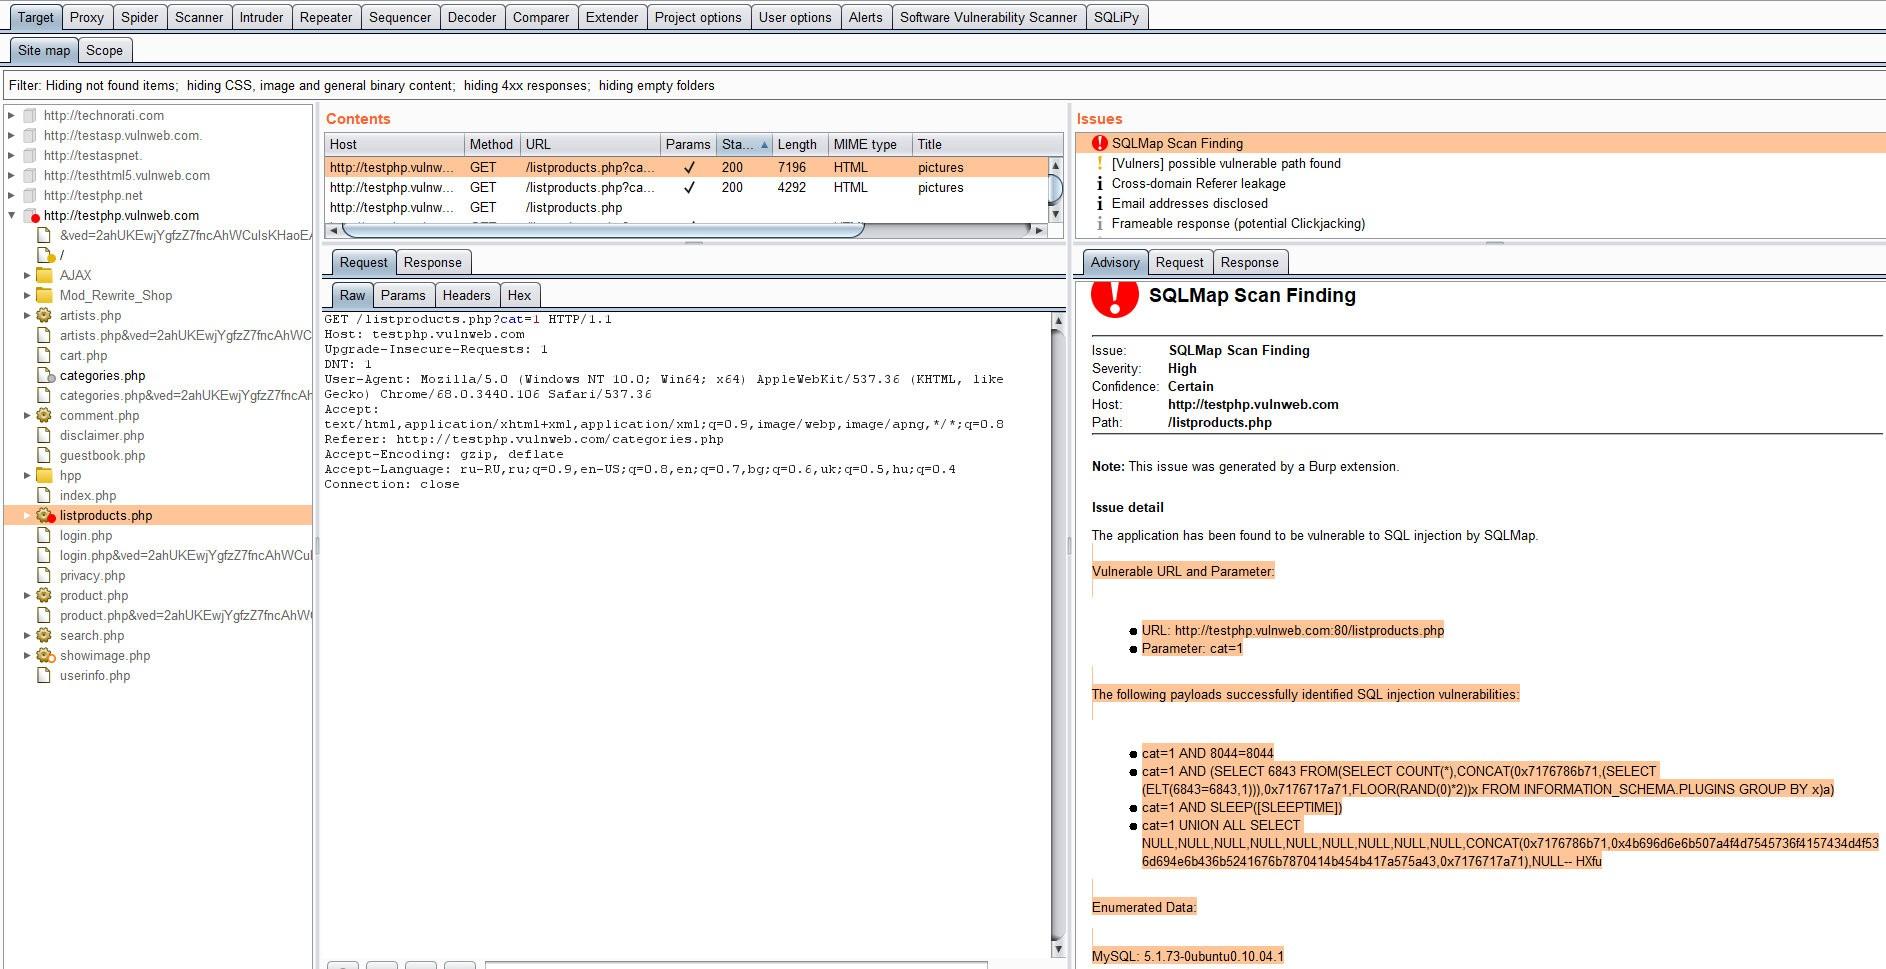 Найденная уязвимость типа SQL-инъекция в панели Issues